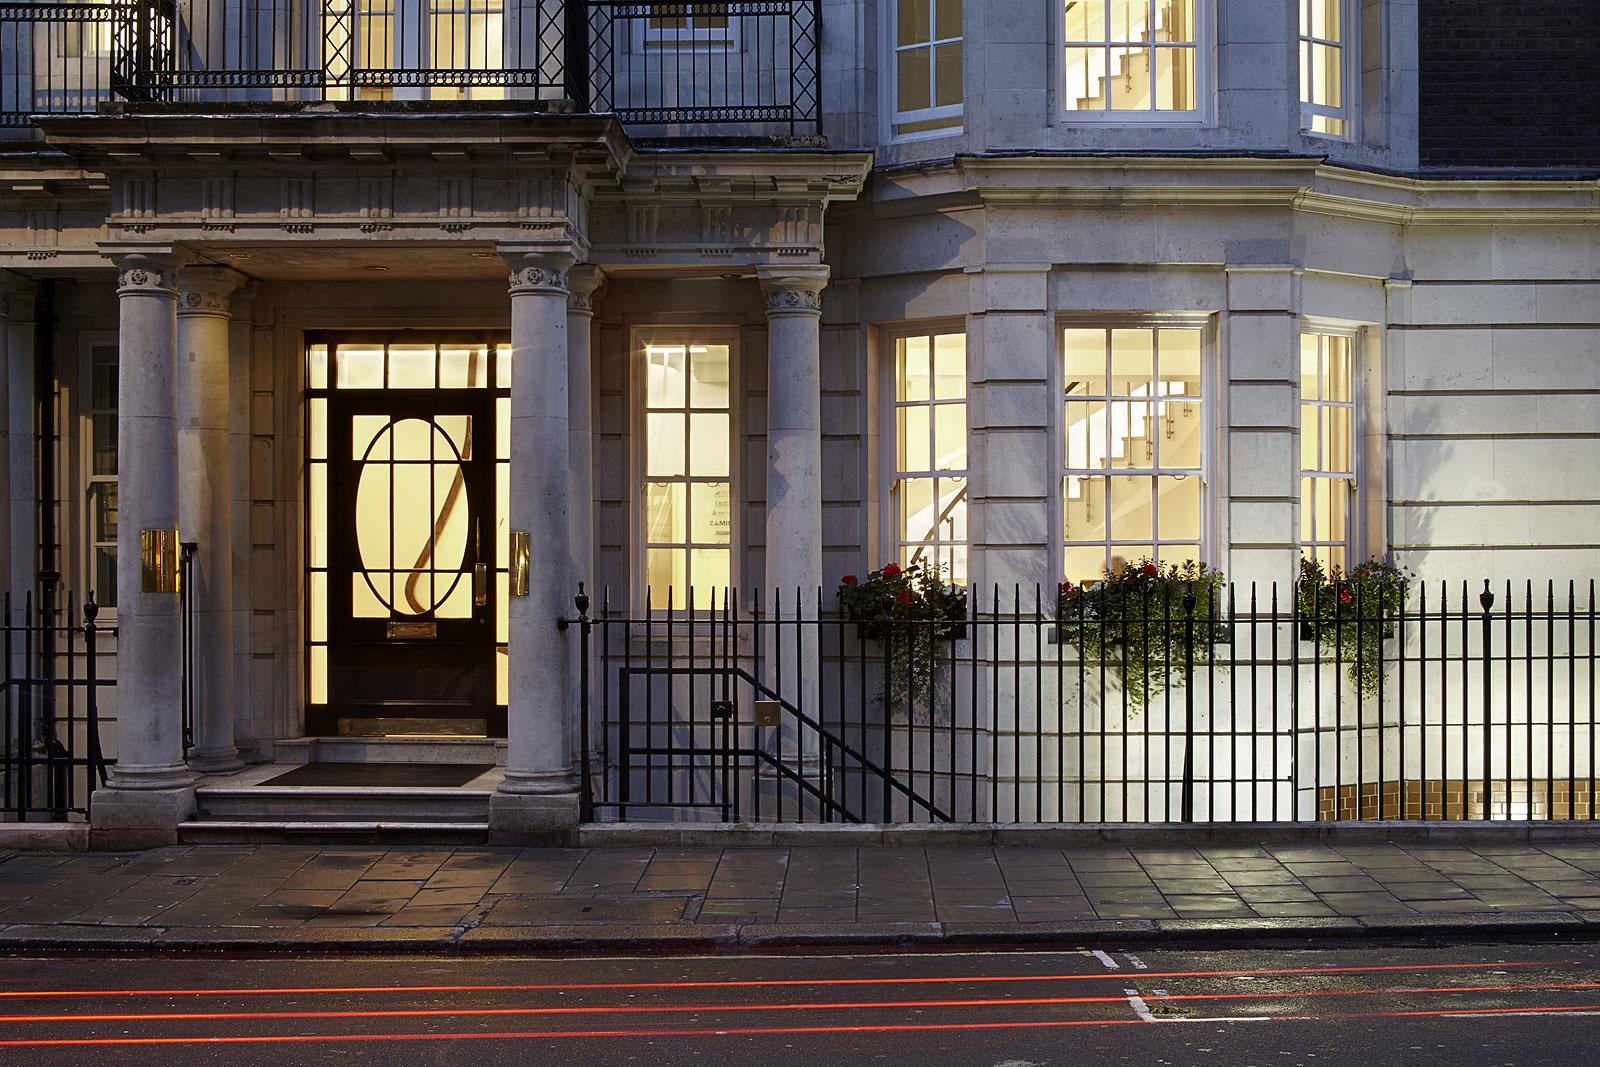 Grosvenor Street, external view of entrance